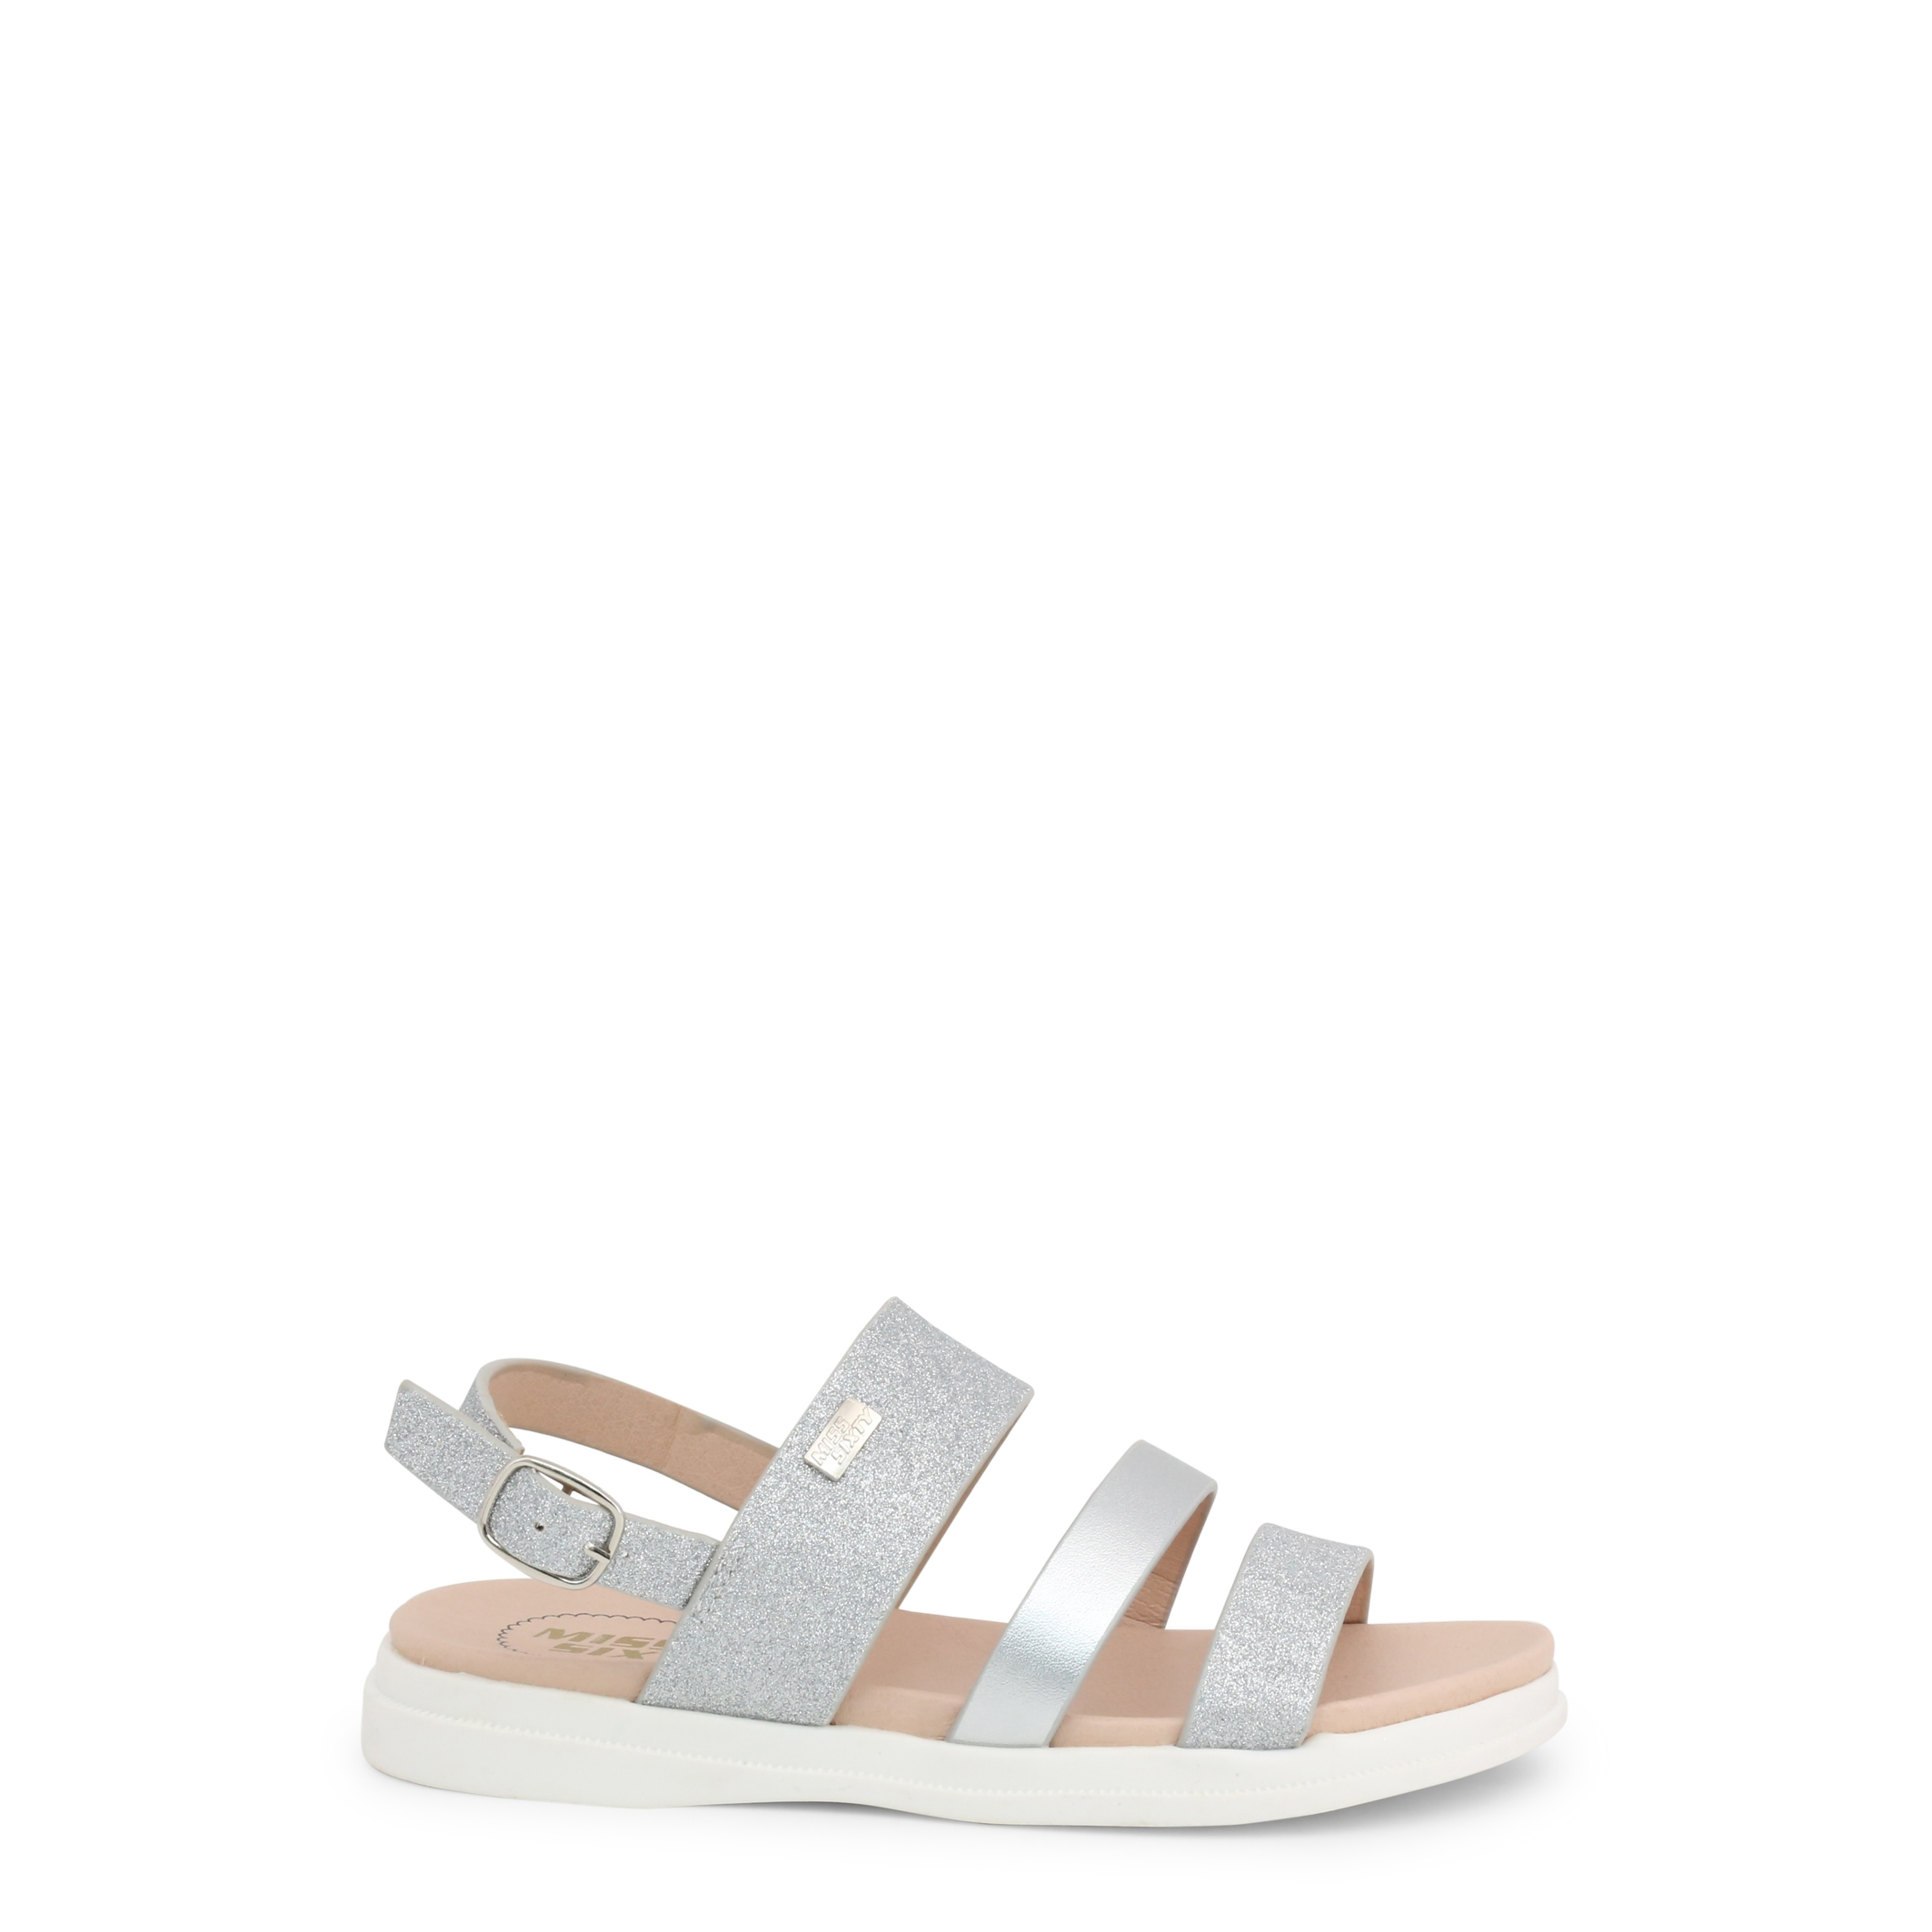 Sandale Miss Sixty MS766 Gri